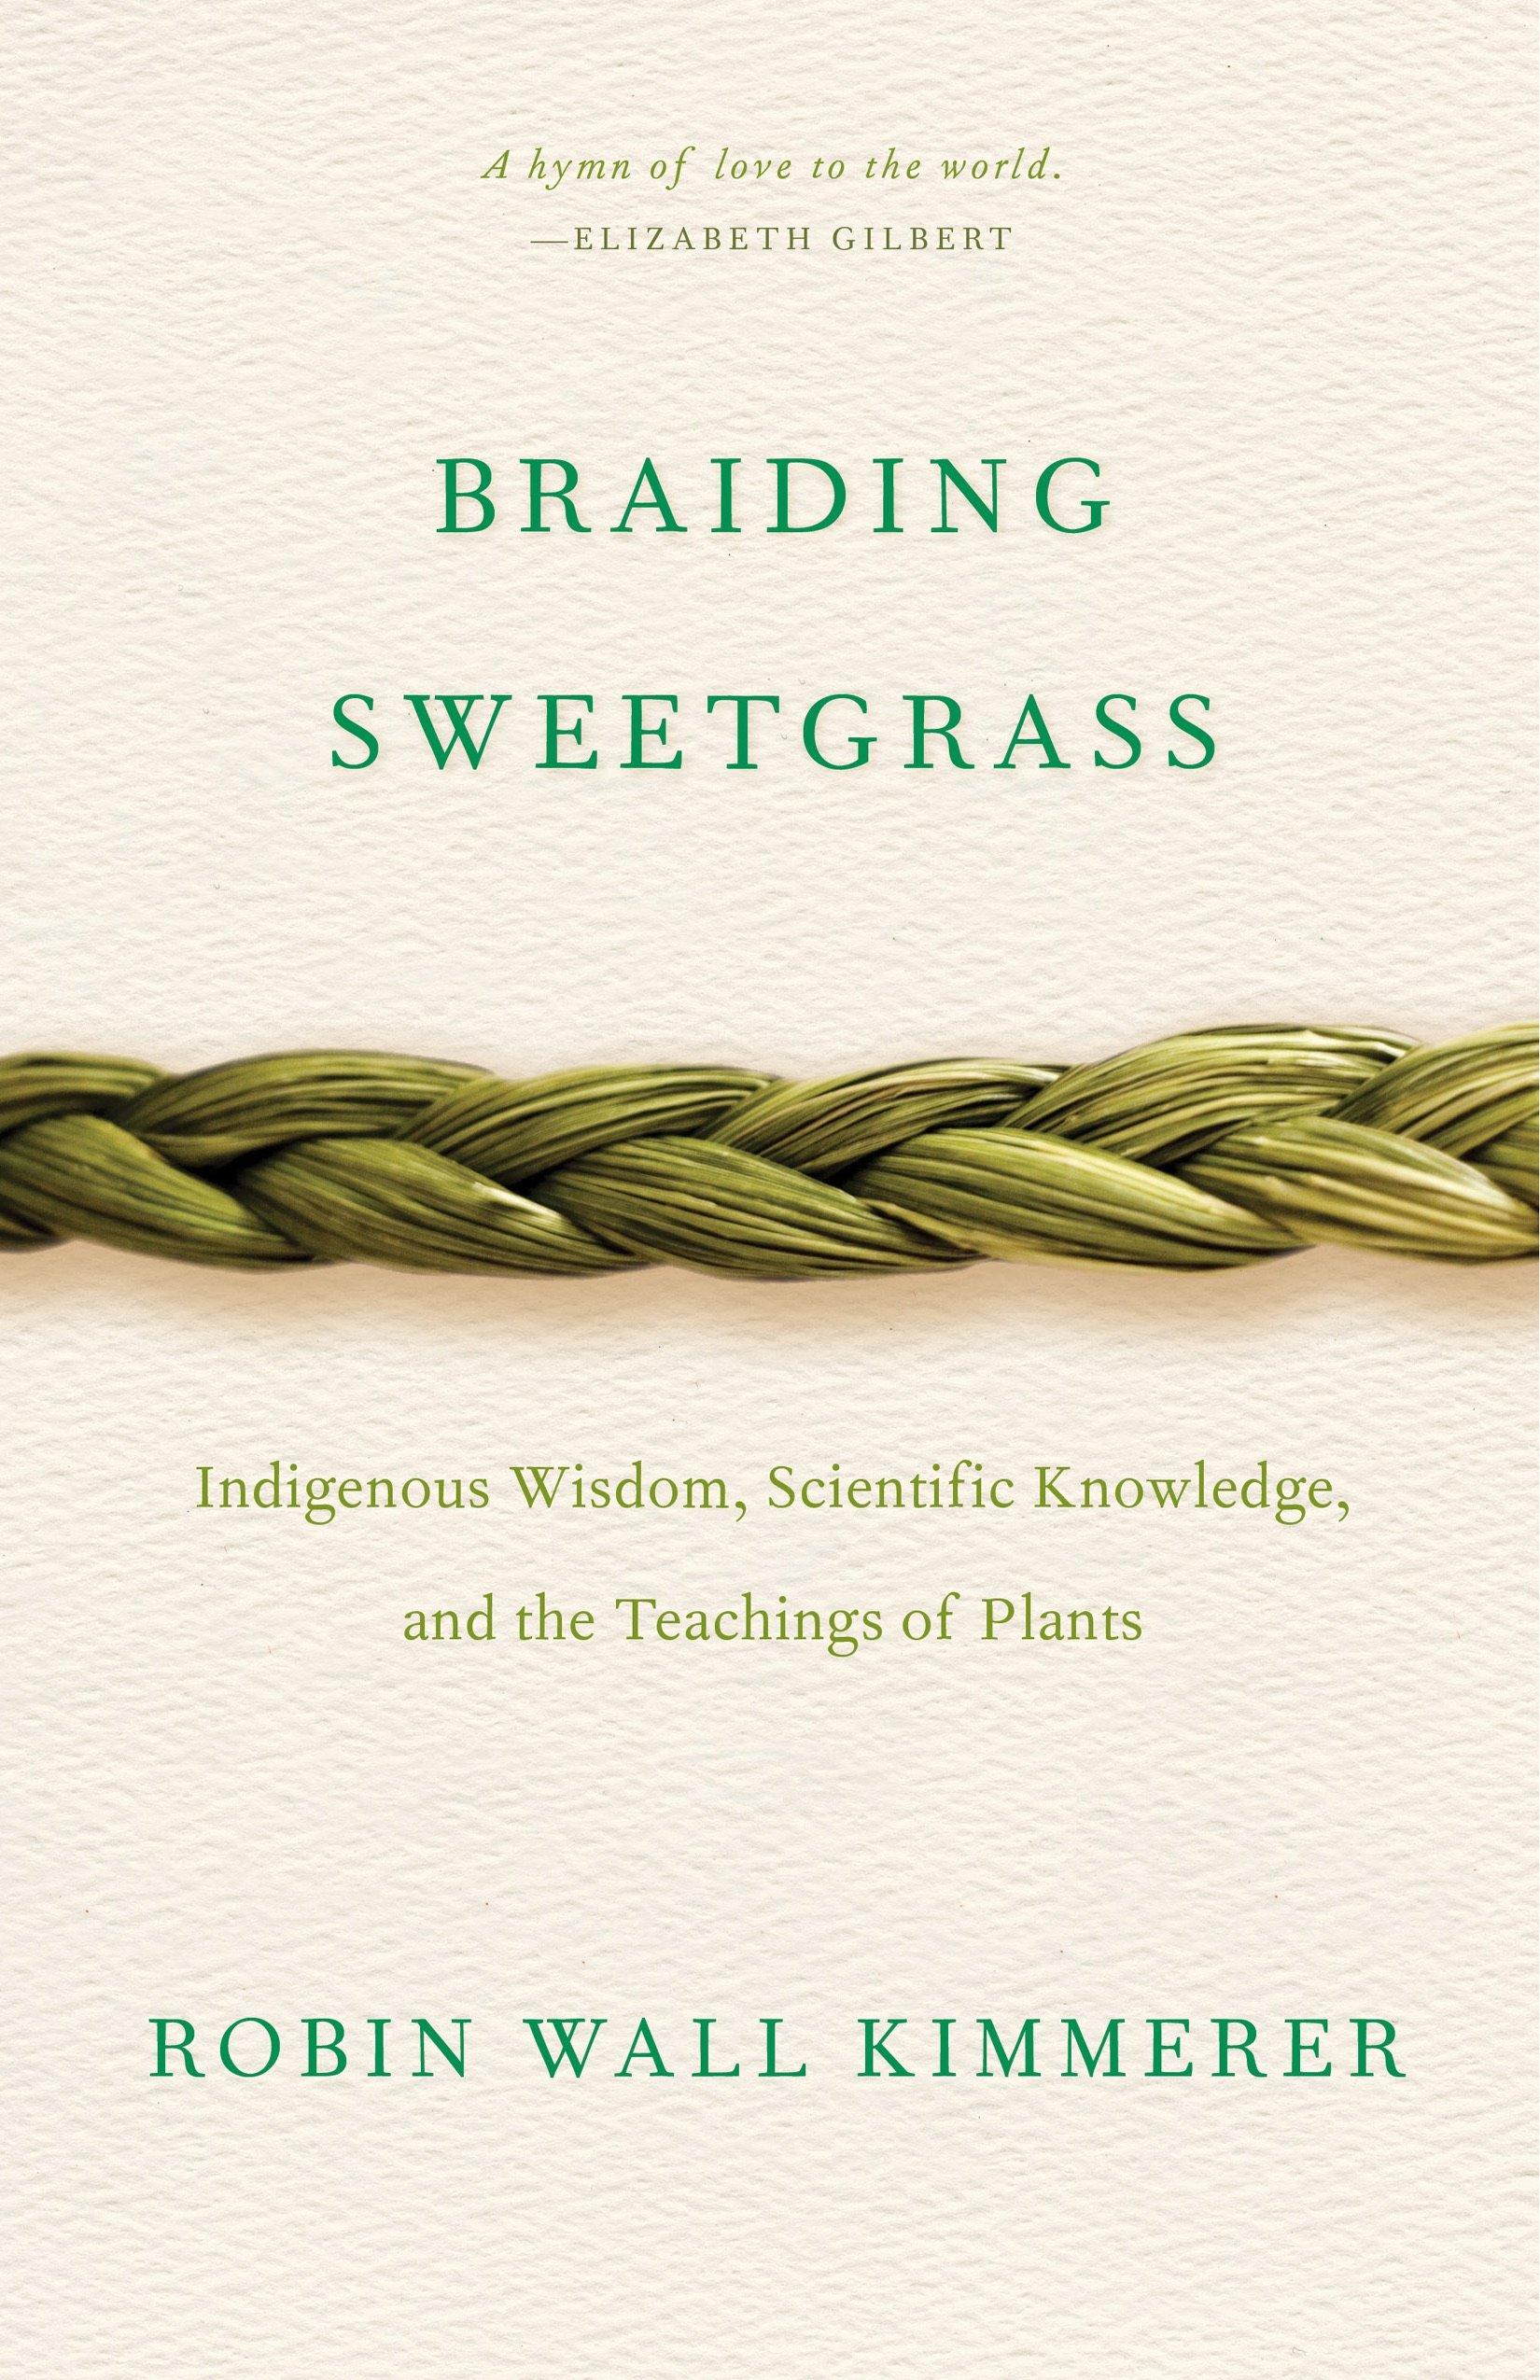 braiding-sweetgrass.jpg